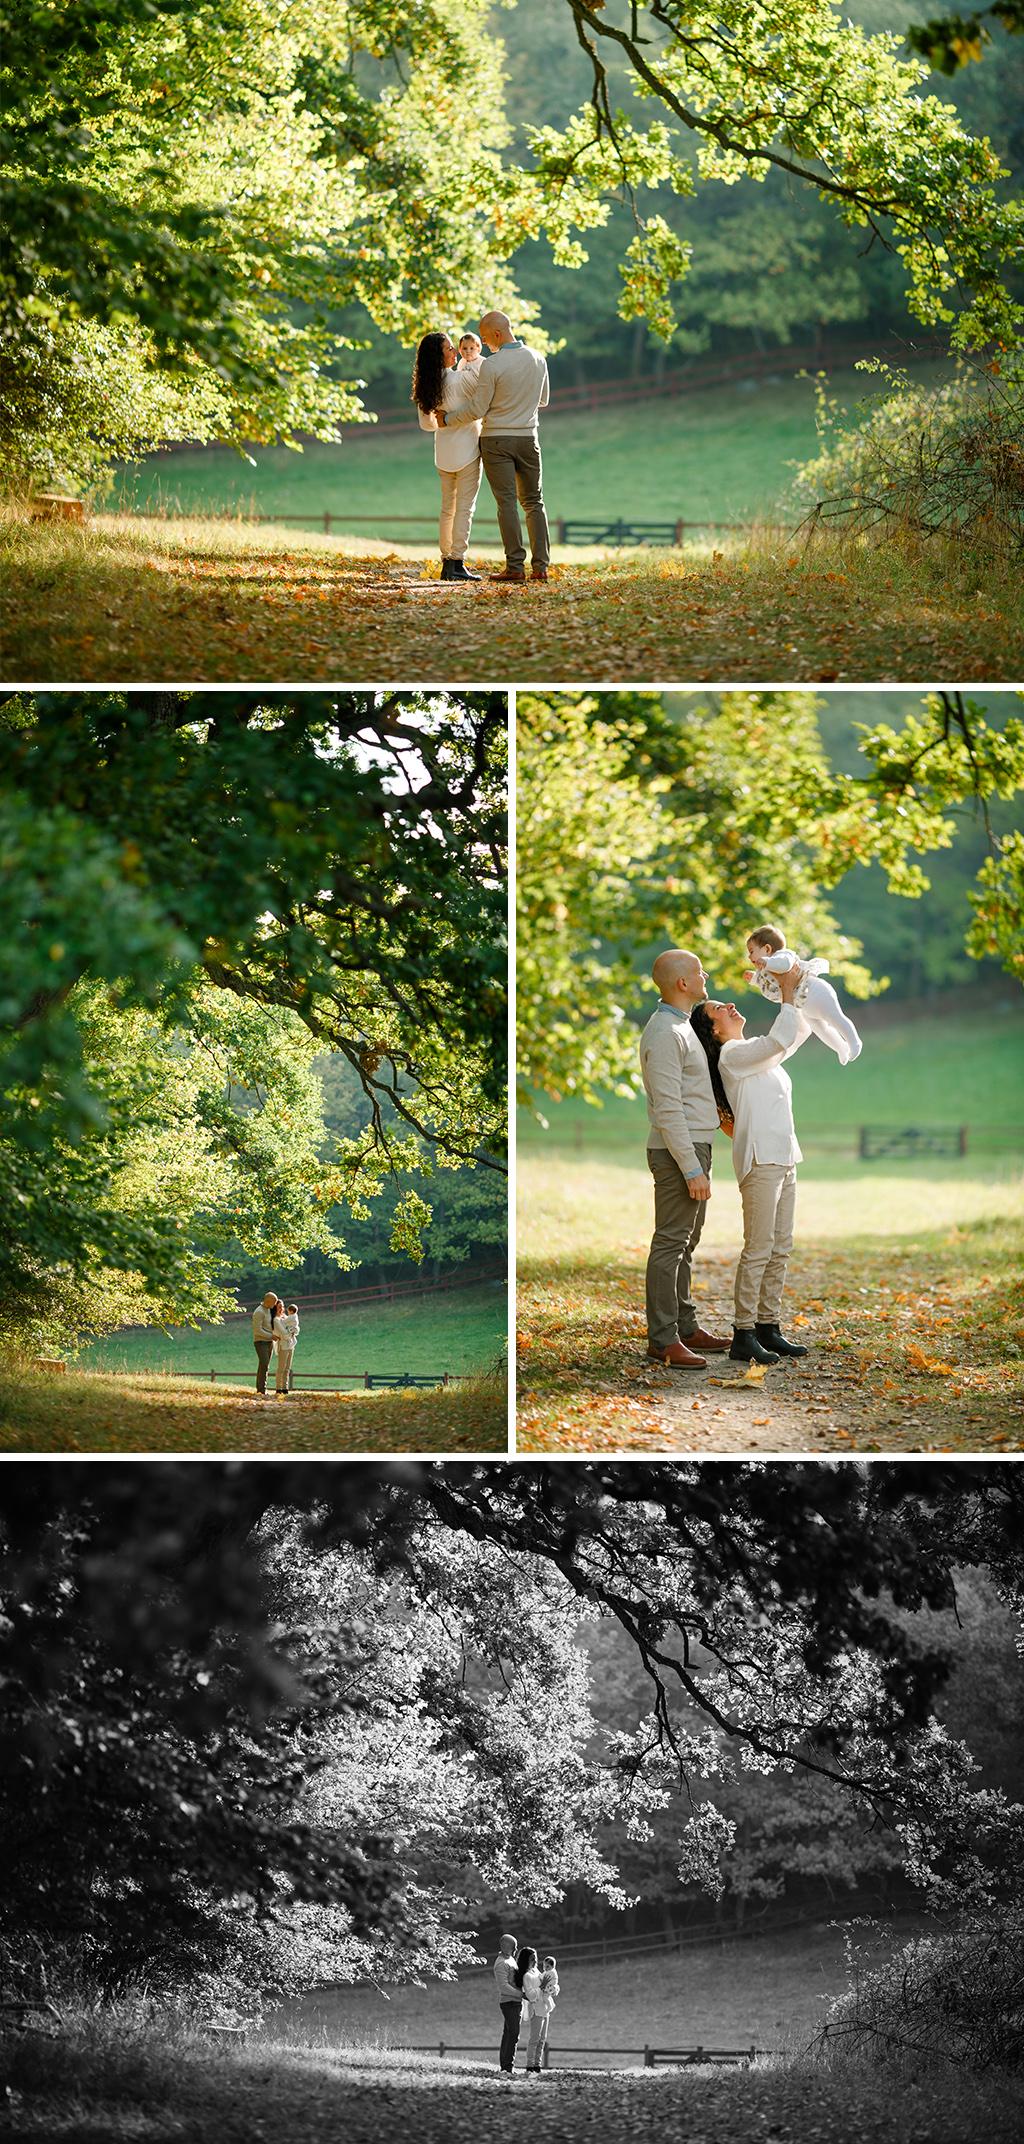 Forsta_familjefotografering_Stockholm_Familjefotograf_3.jpg